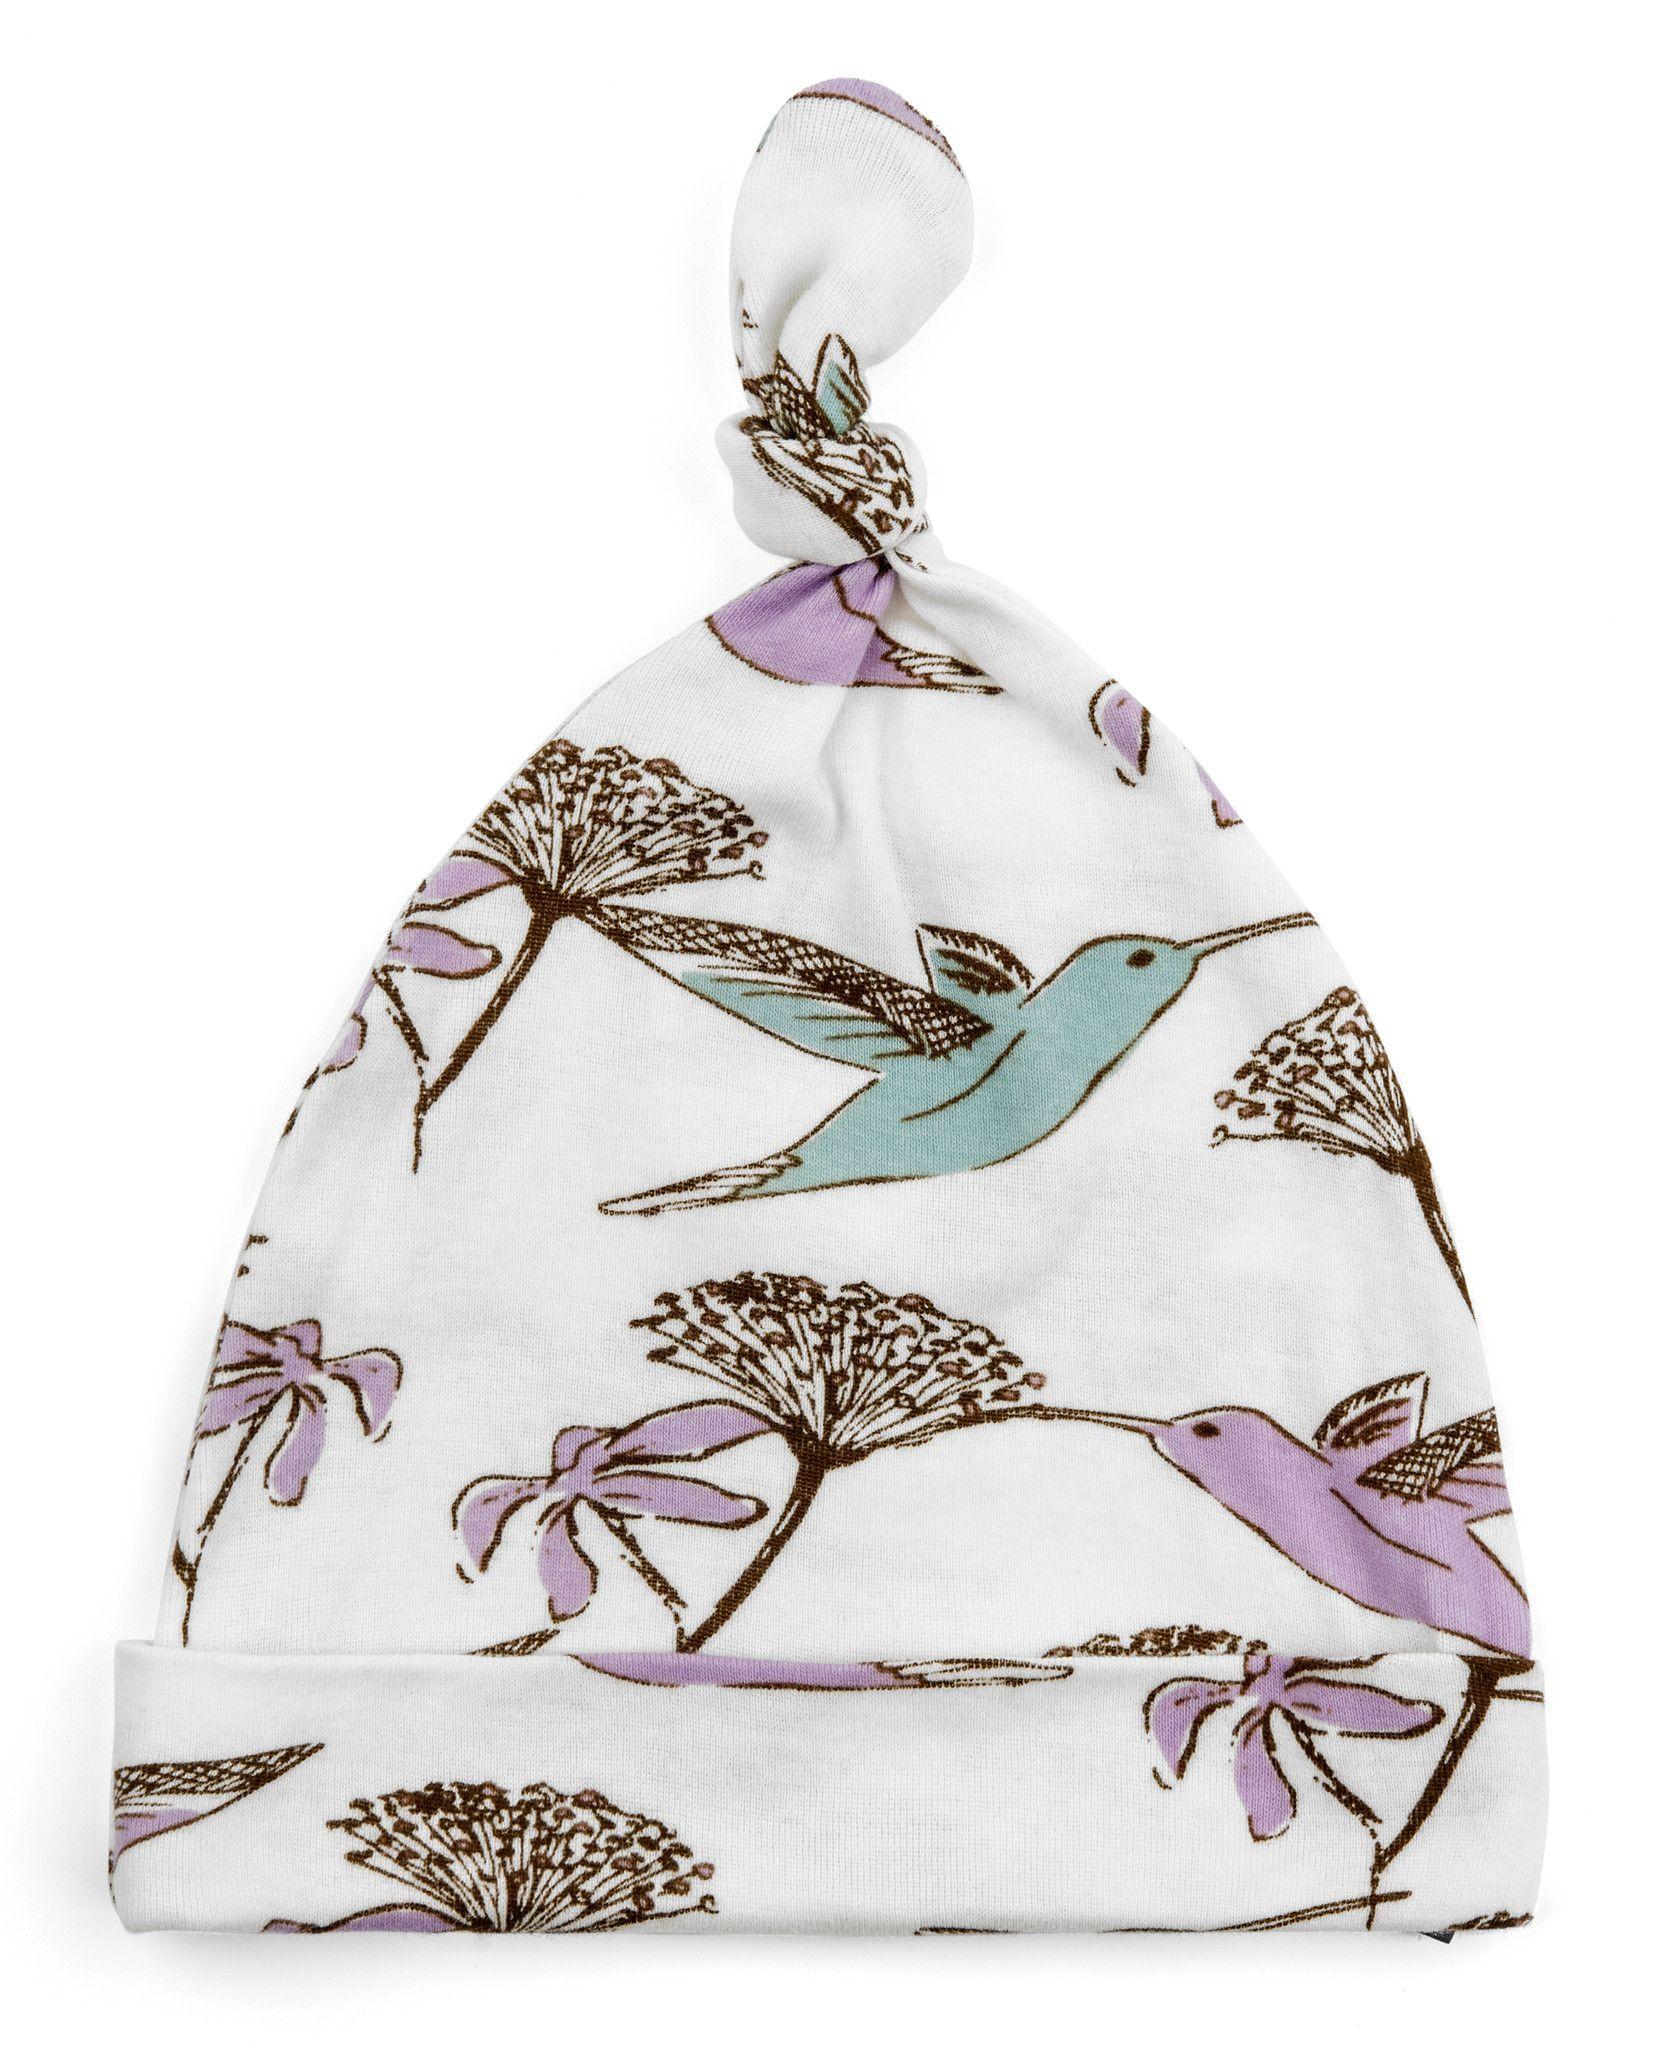 Knotted Hat by MilkBarn Baby - Hummingbird